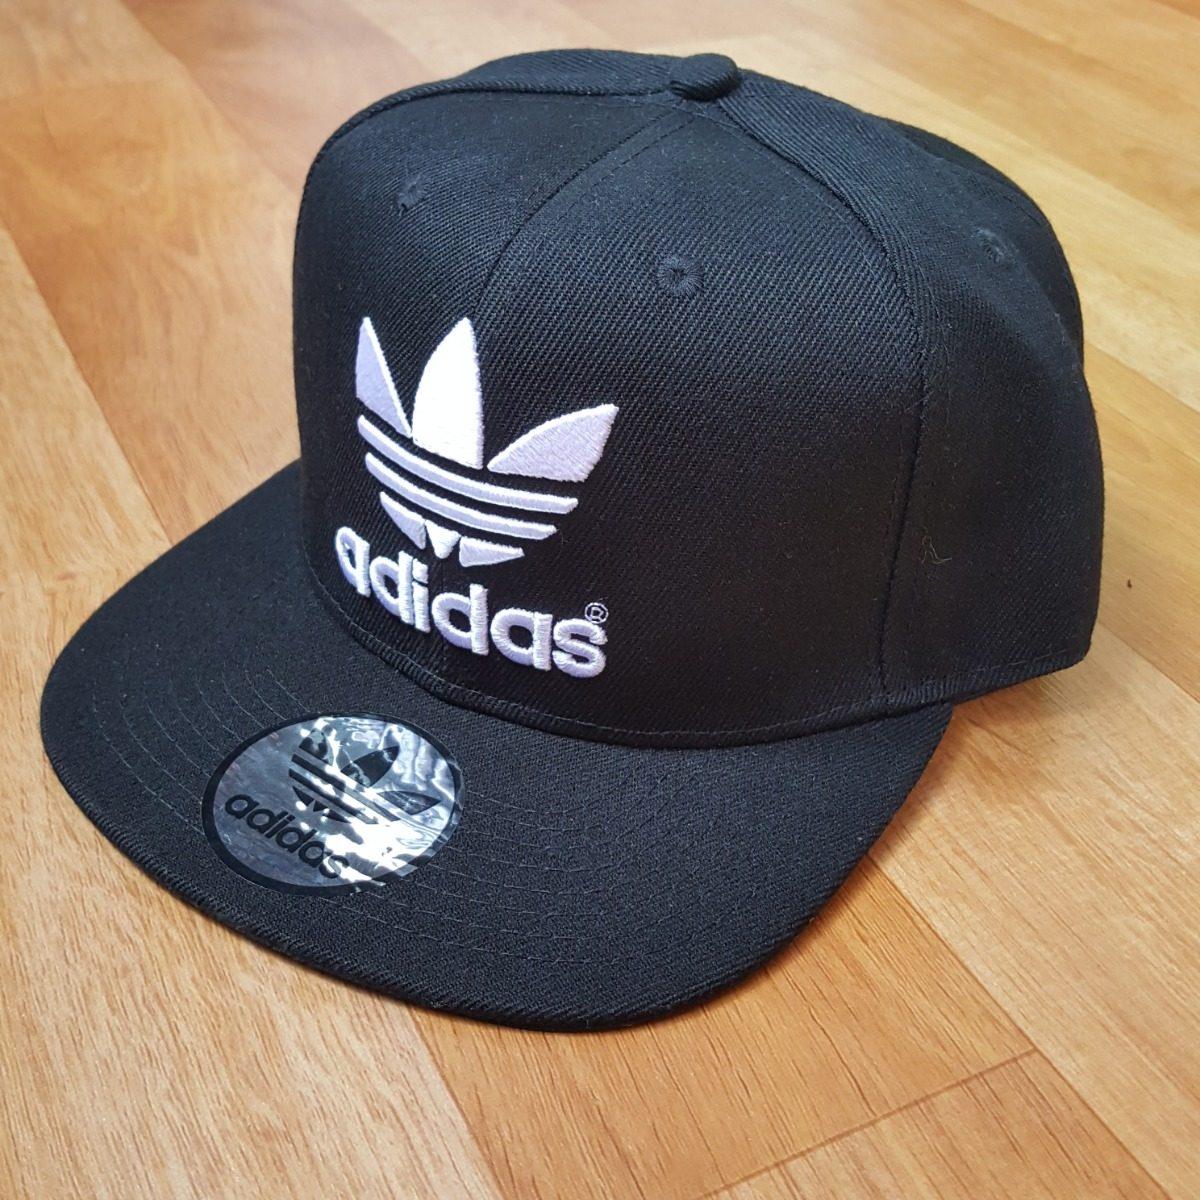 gorra visera adidas originals negra negra importada. Cargando zoom. 9053c8cfb6b